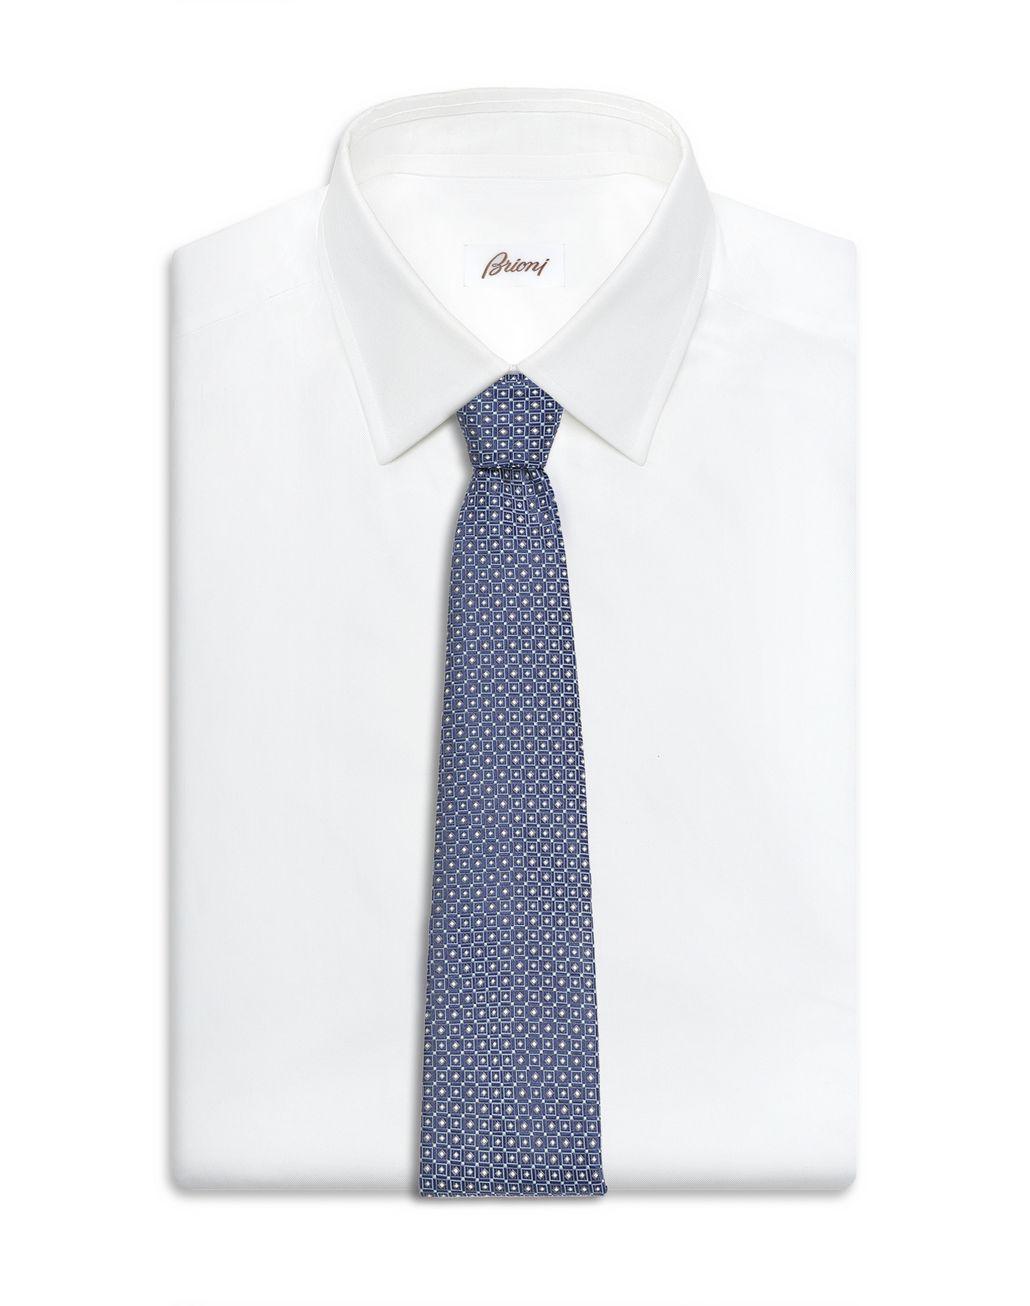 BRIONI 宝蓝色大号图案领带 领带 男士 d